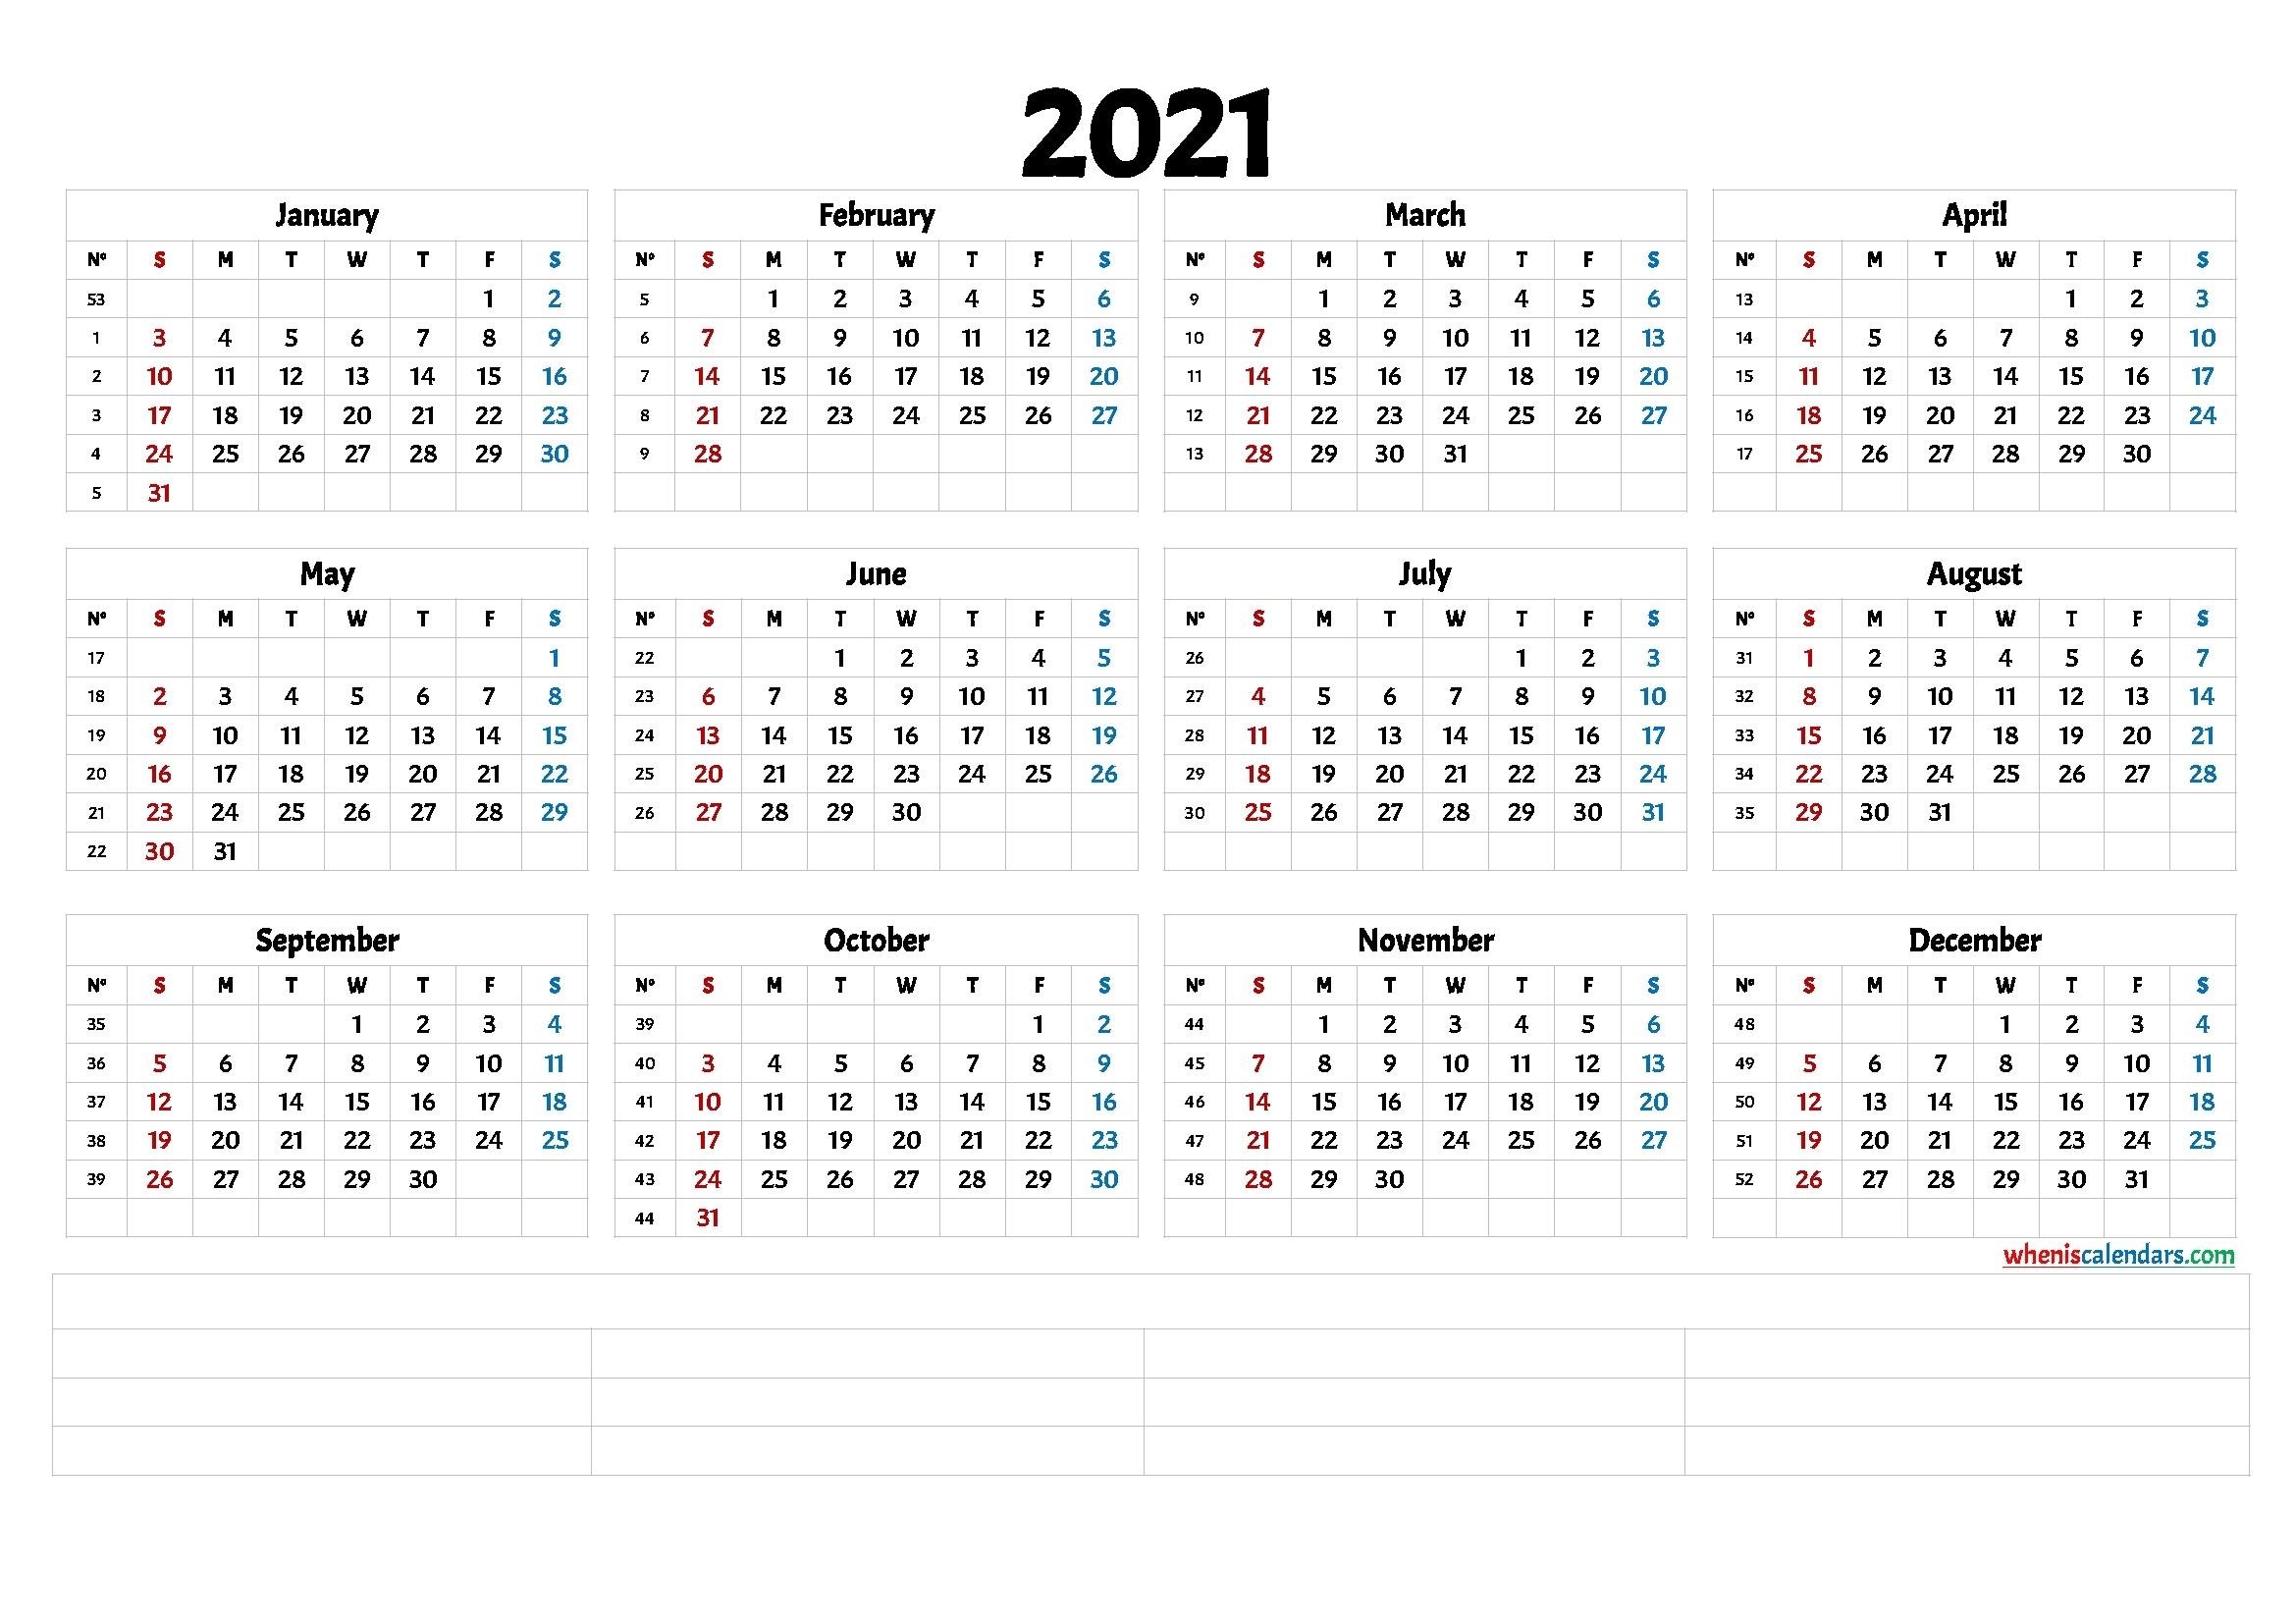 2021 Printable Yearly Calendar With Week Numbers - Calendraex